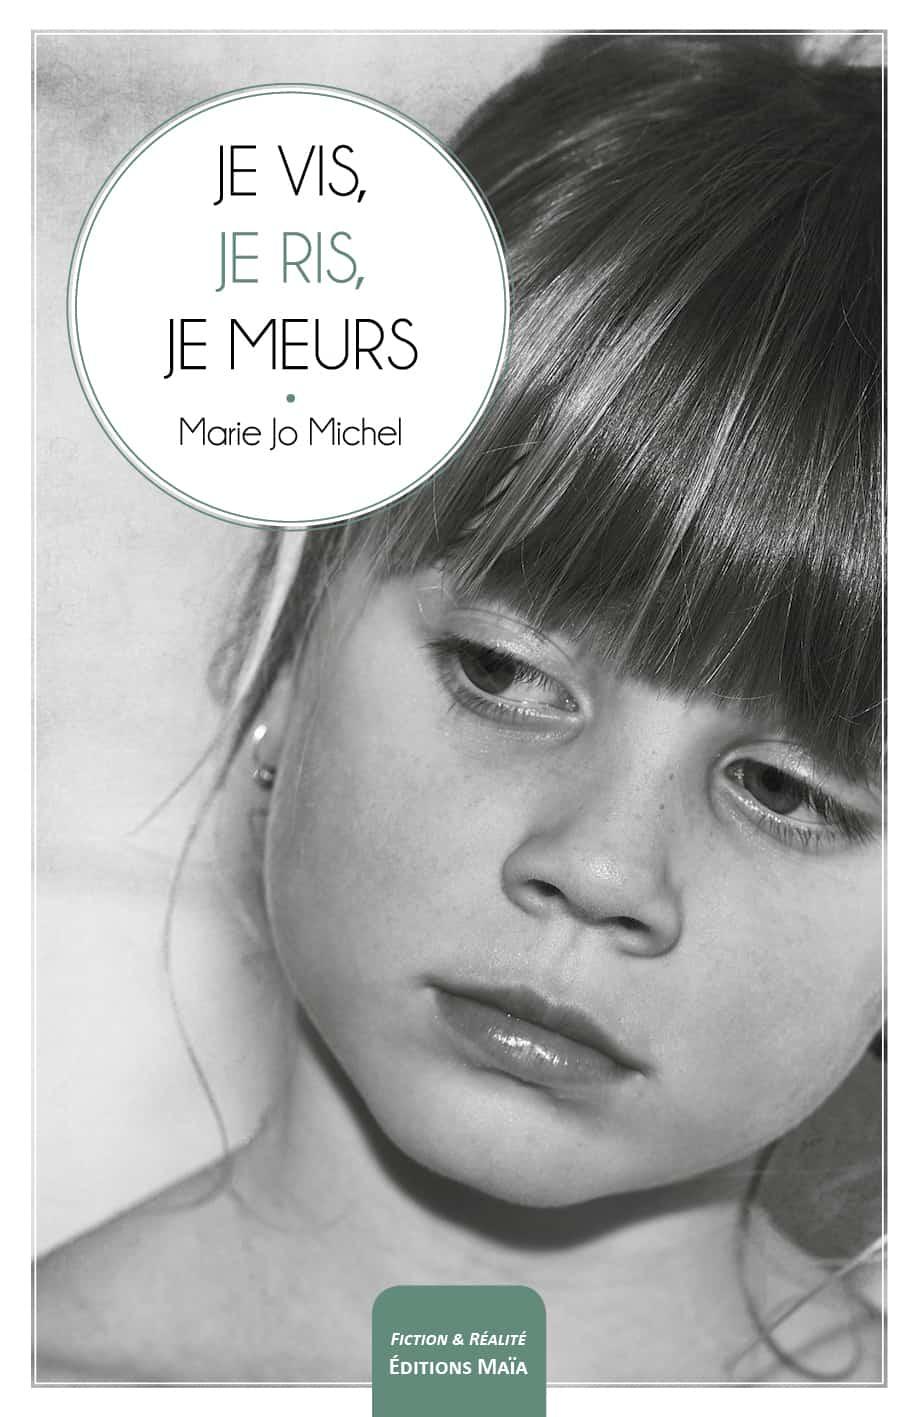 Entretien avec Marie-Jo Michel – Je vis, je ris, je meurs